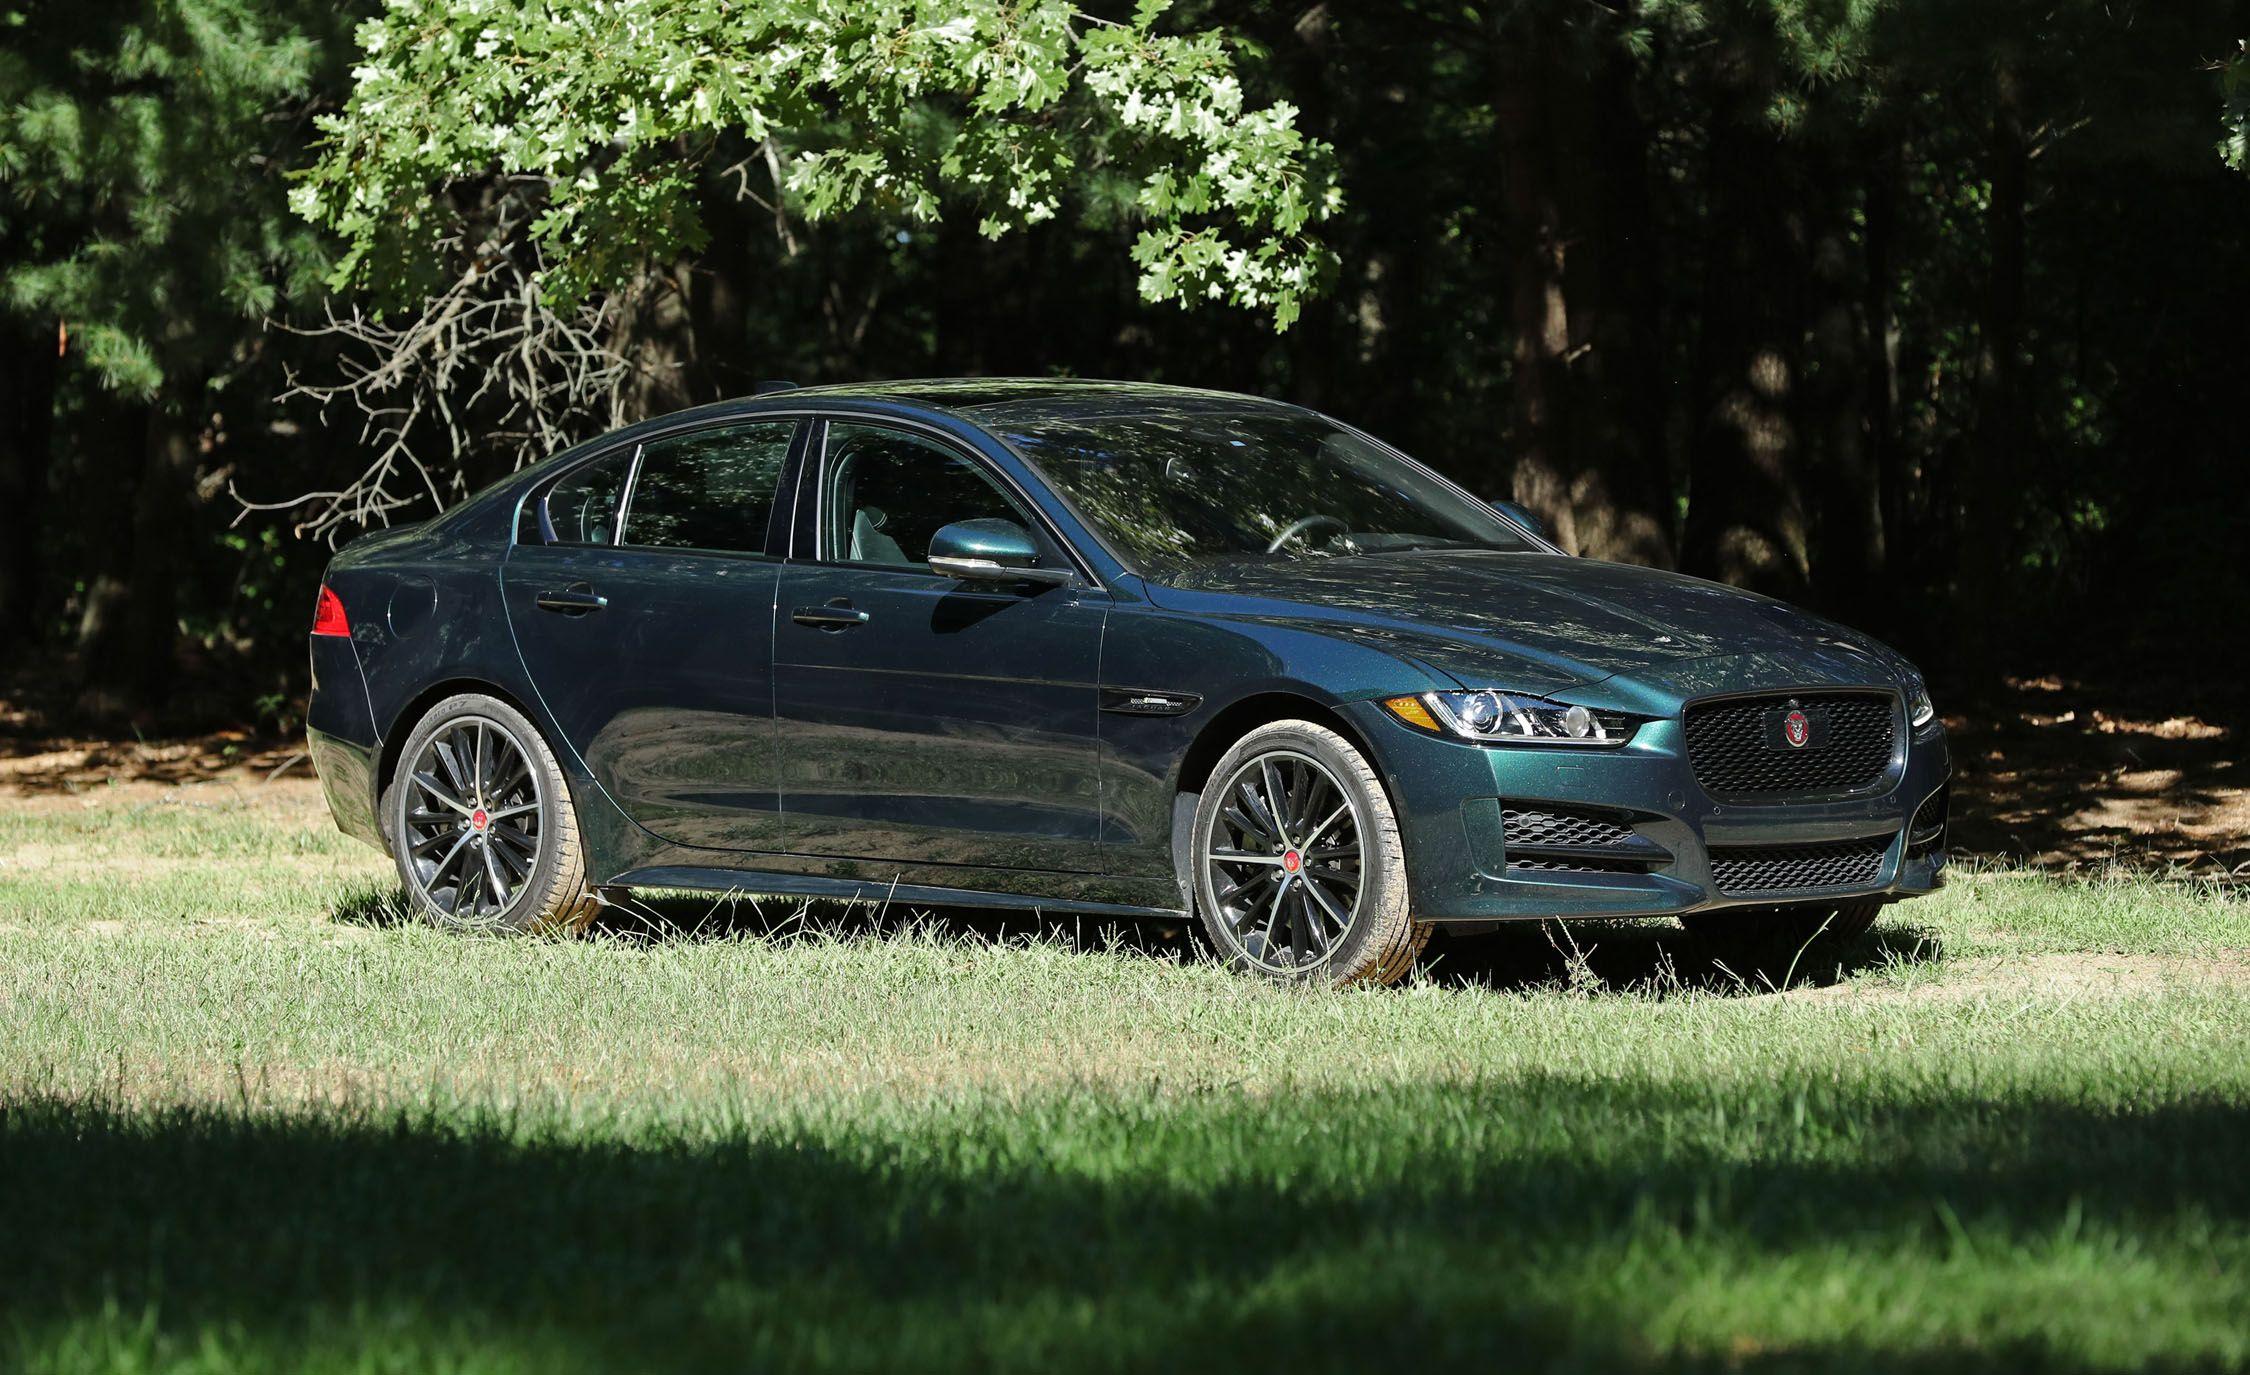 2017 Jaguar XE 20d AWD Tested Review